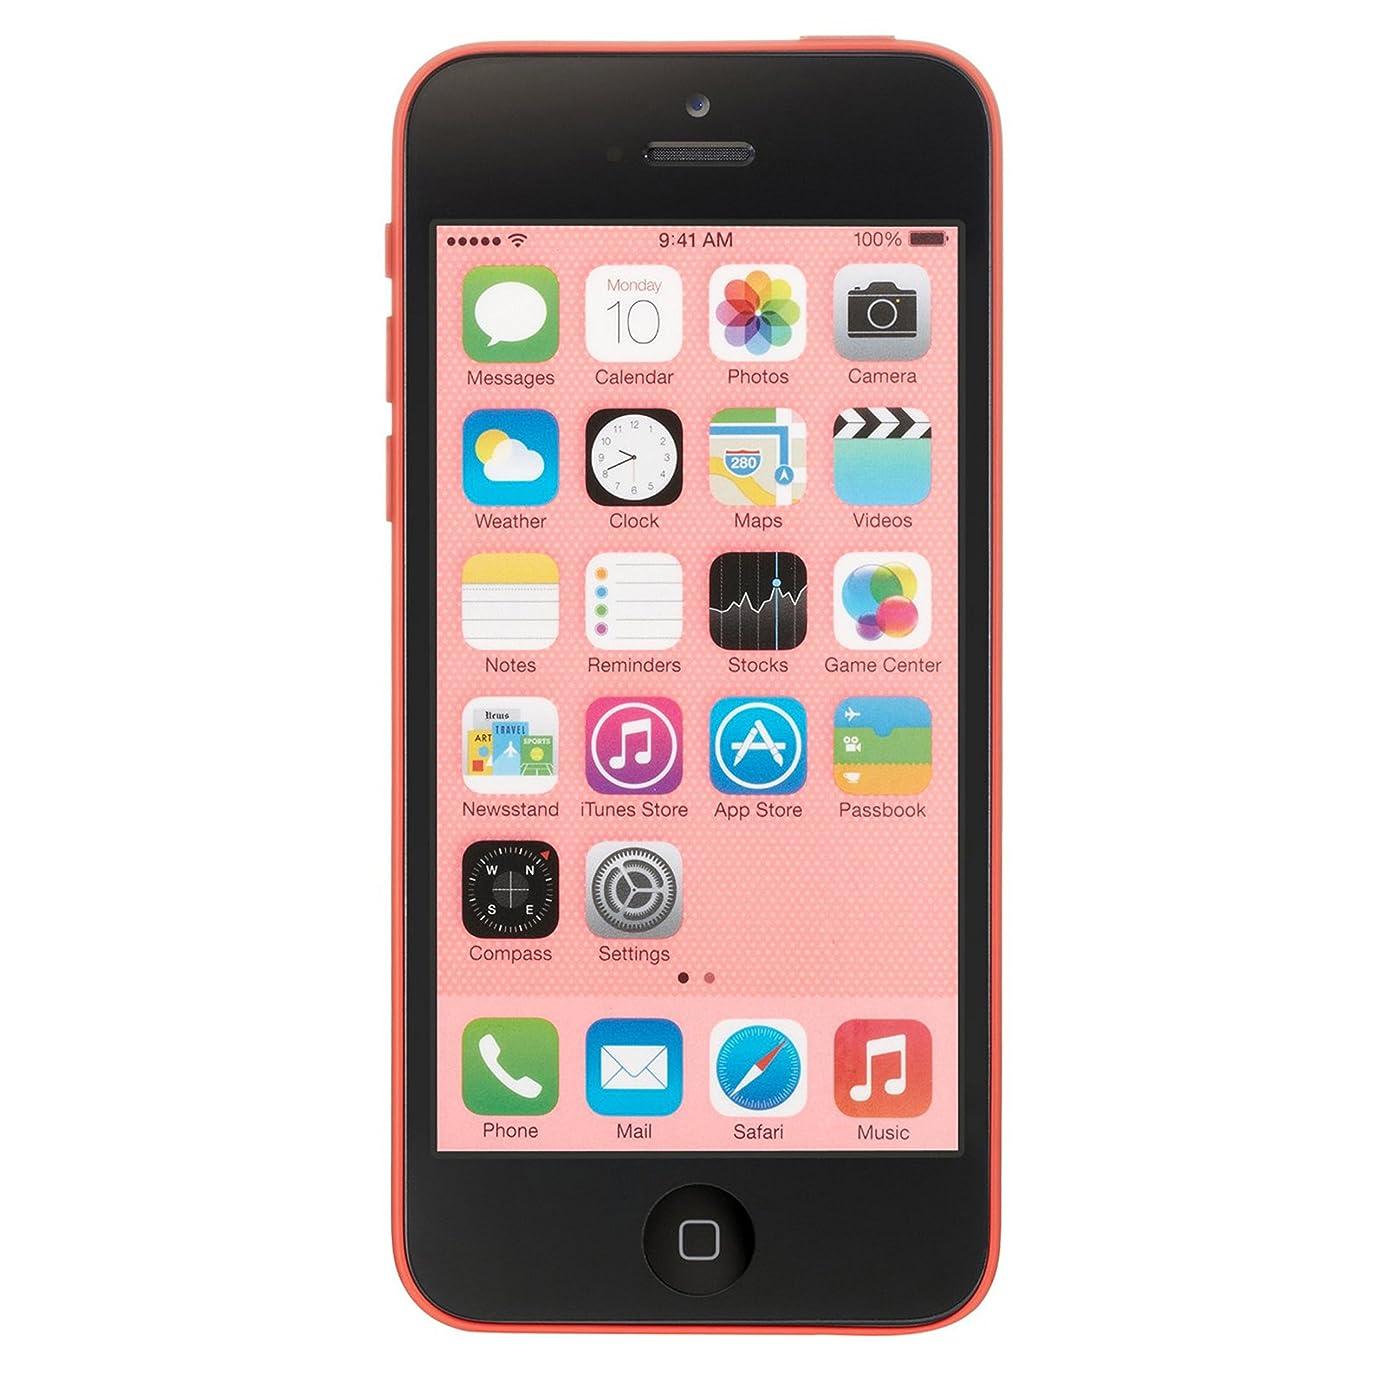 Apple iPhone 5C, GSM Unlocked, 8GB - Pink (Refurbished)